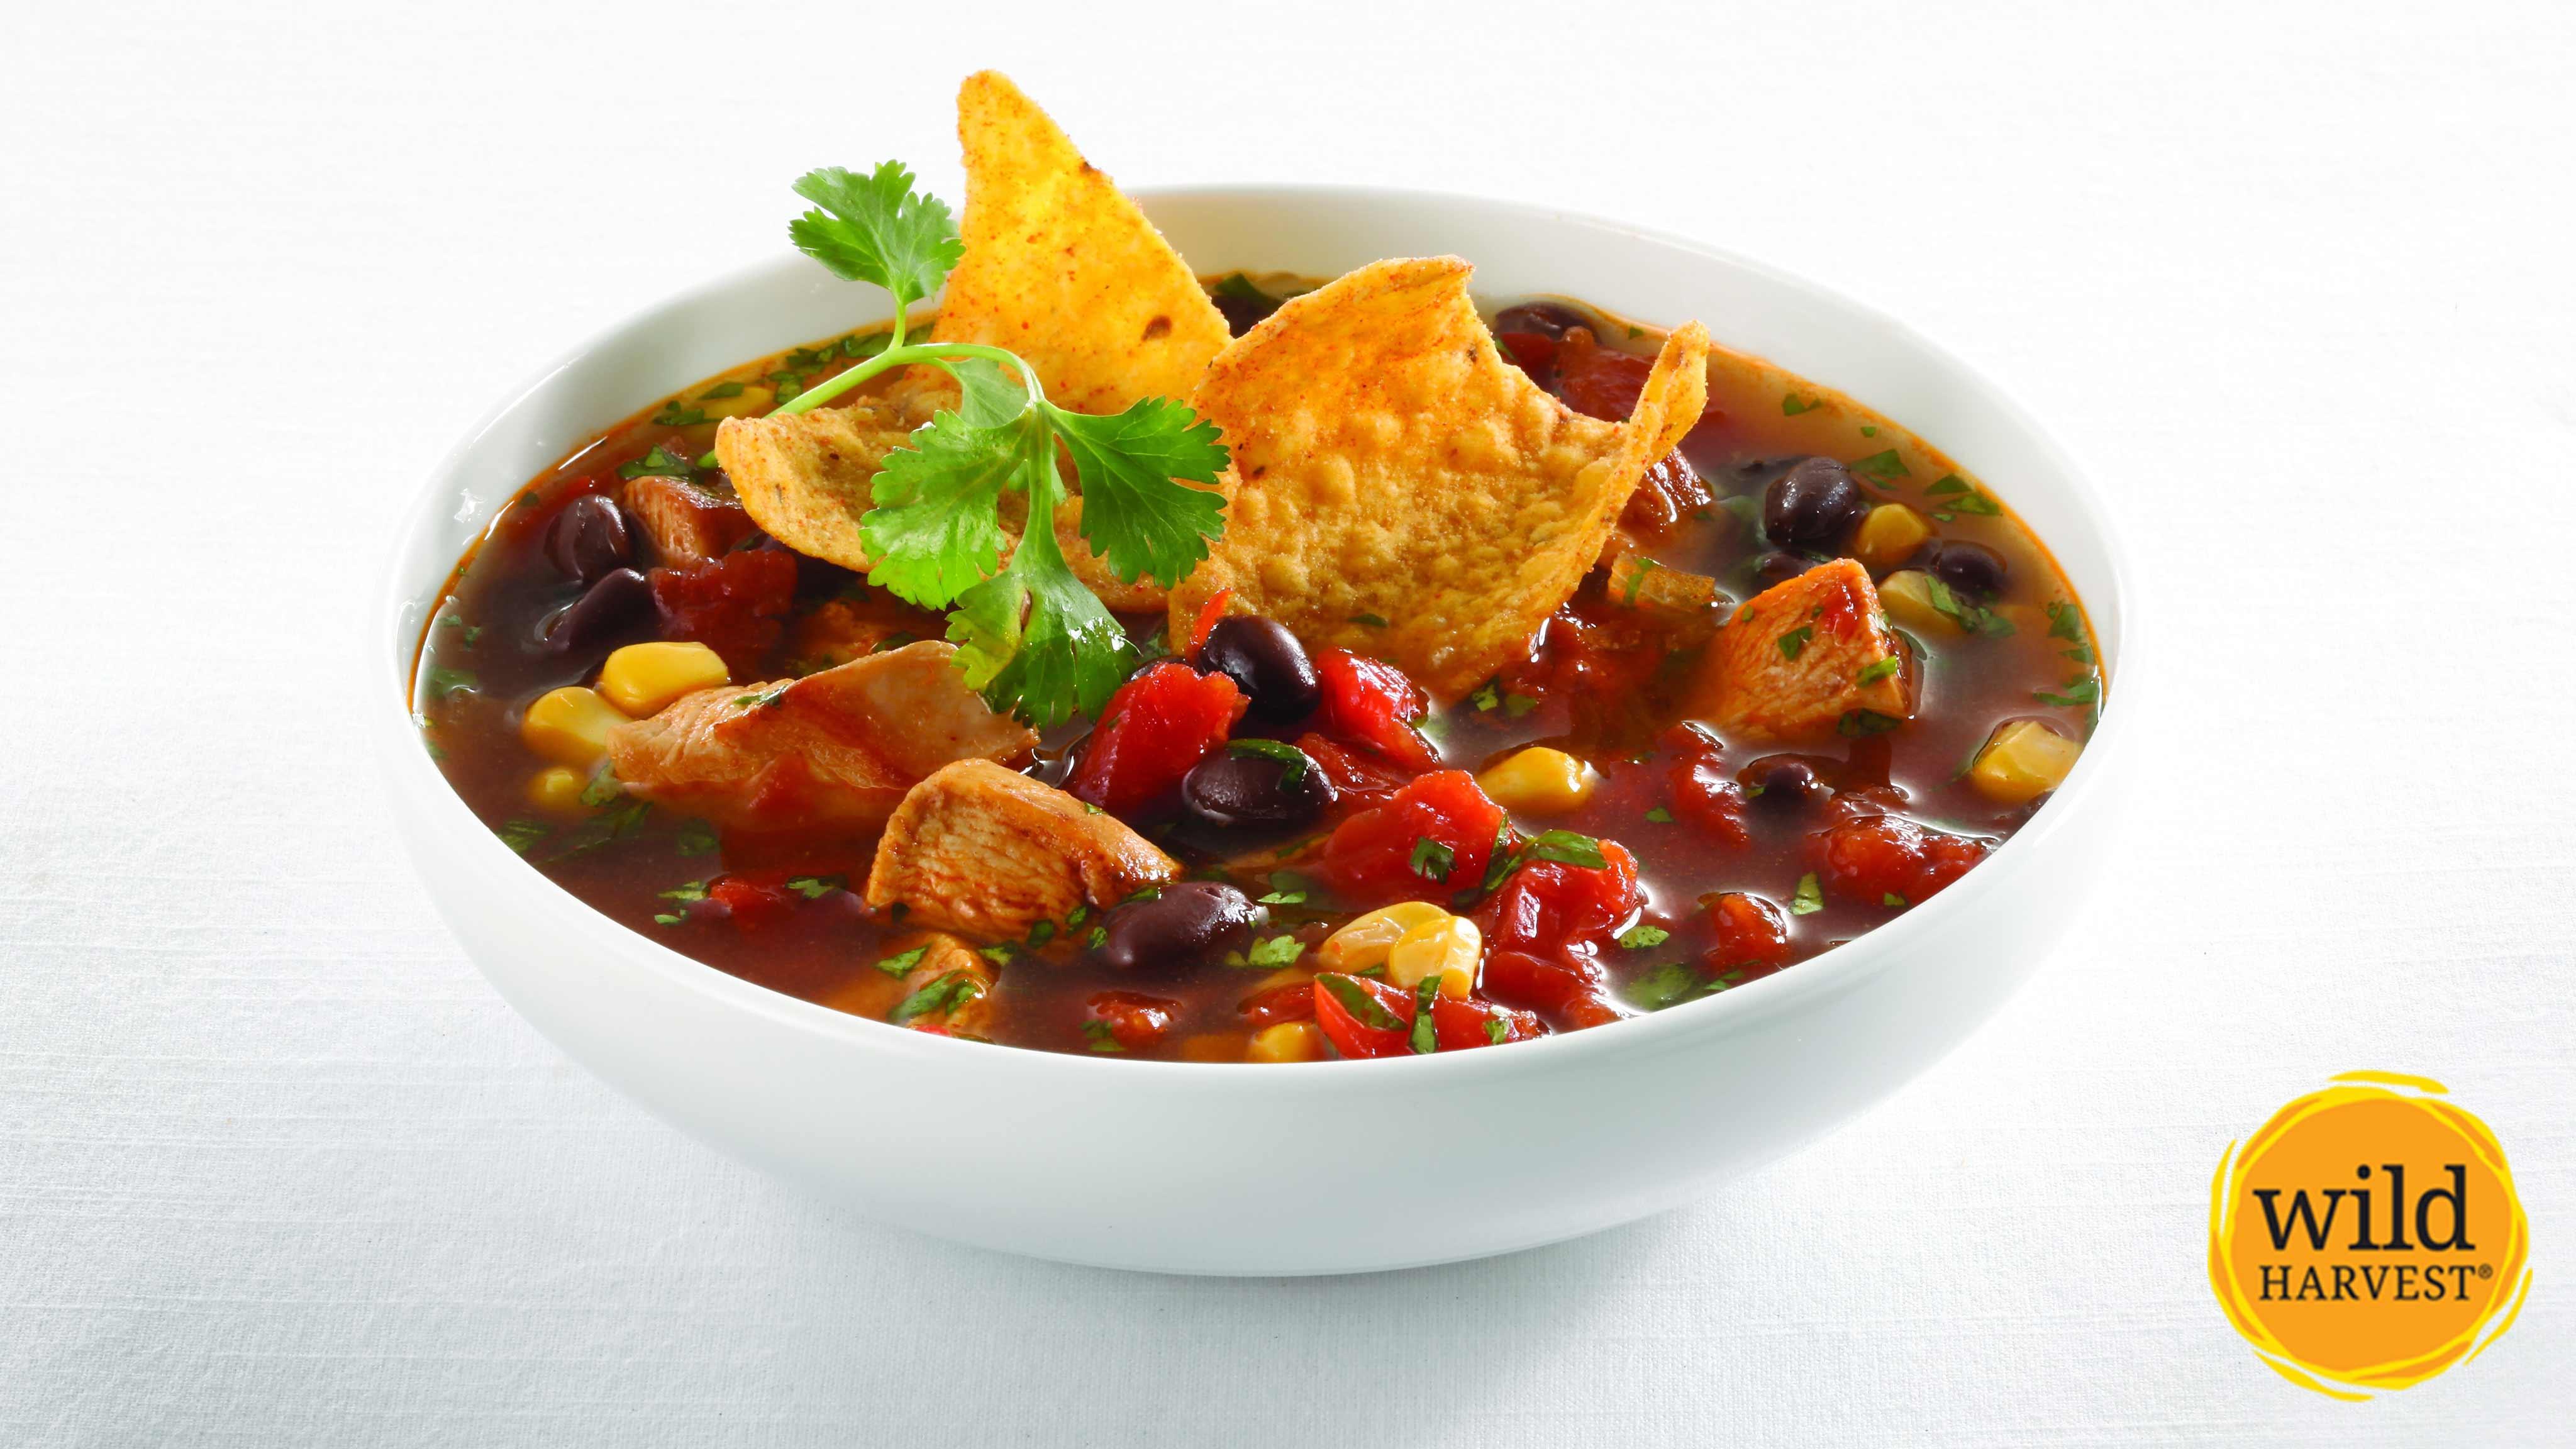 Image for Recipe Chicken Tortilla Soup